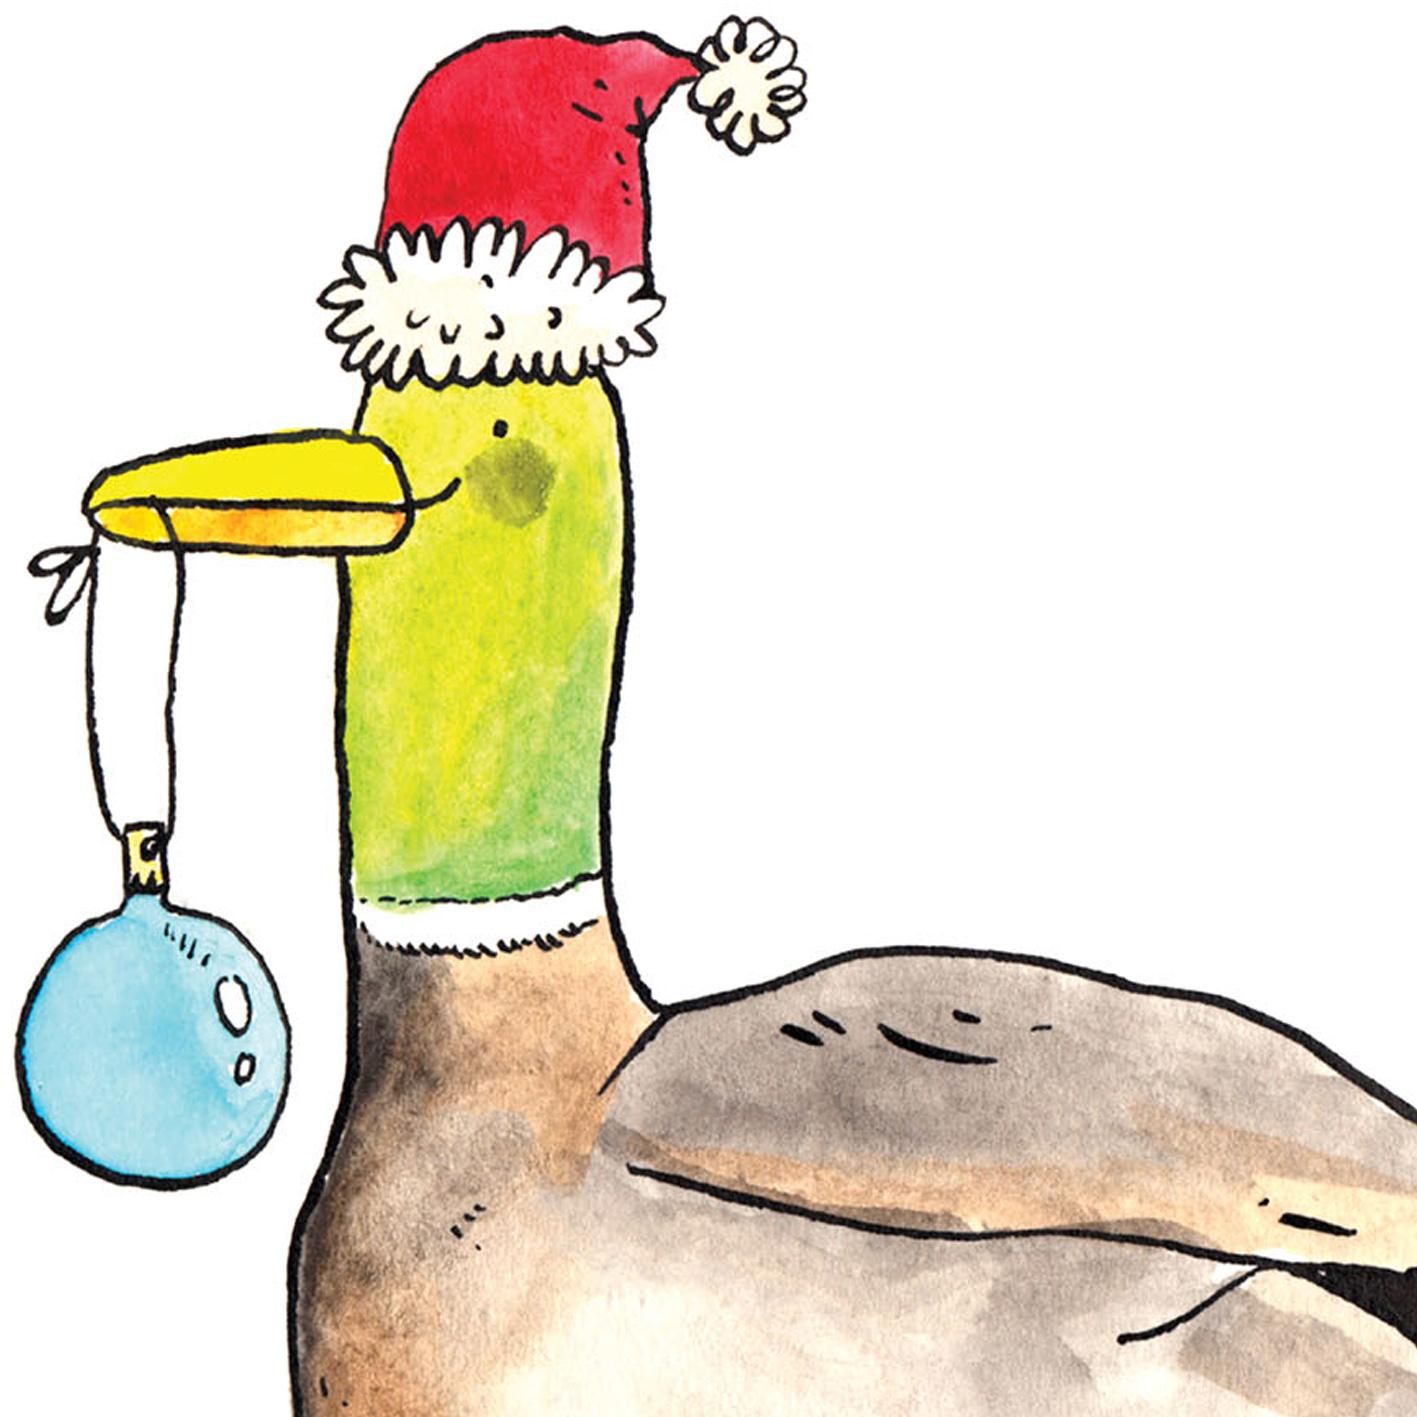 Christmas-Quacker_-Christmas-card-with-duck-pun.-Duck-themed-Christmas-card_CH11_CU